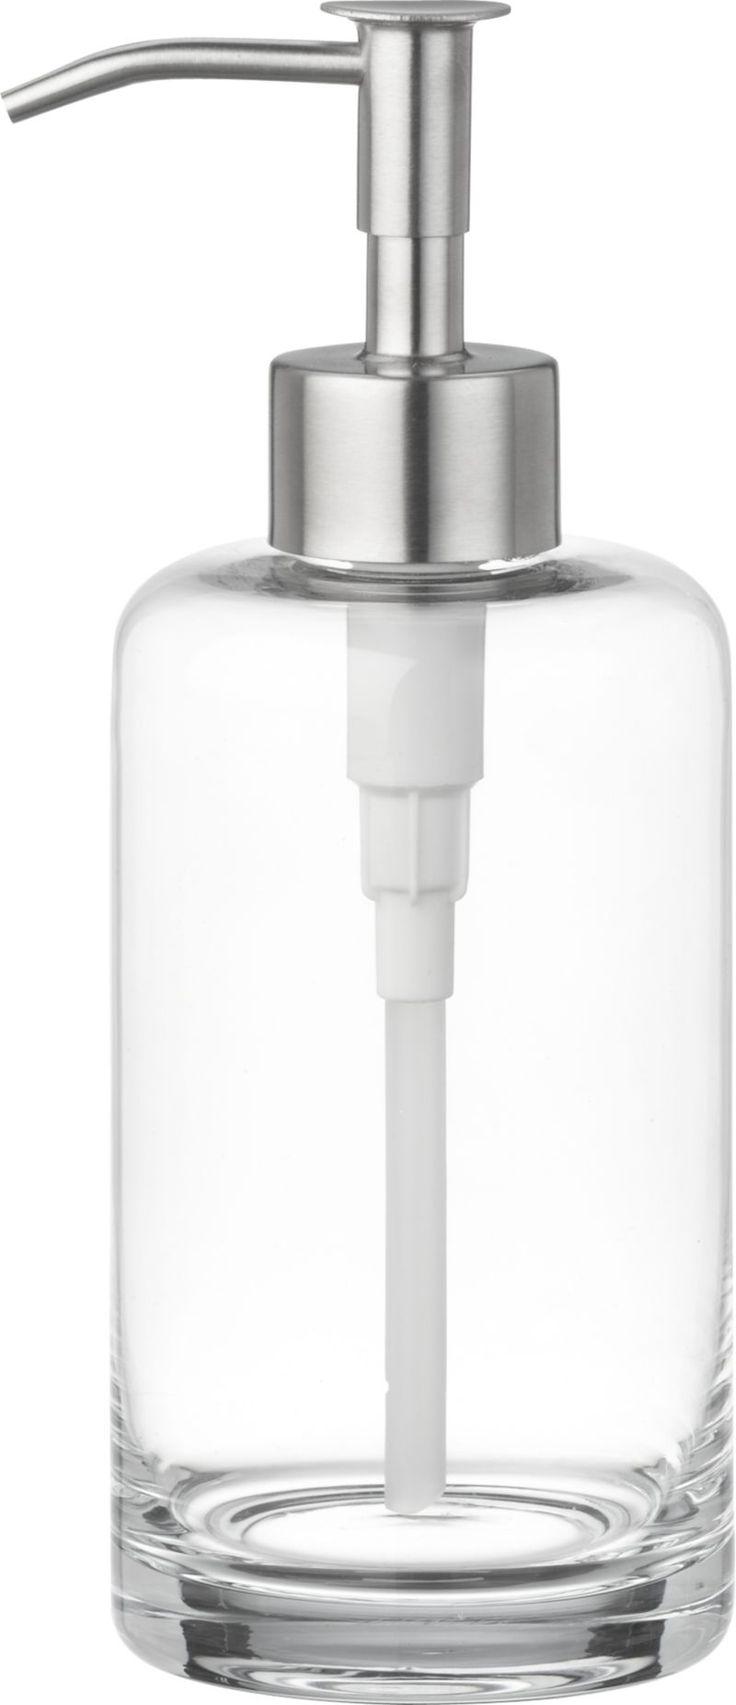 Duck Egg Blue Bathroom Accessories 25 Best Ideas About Contemporary Kids Bathroom Accessories On